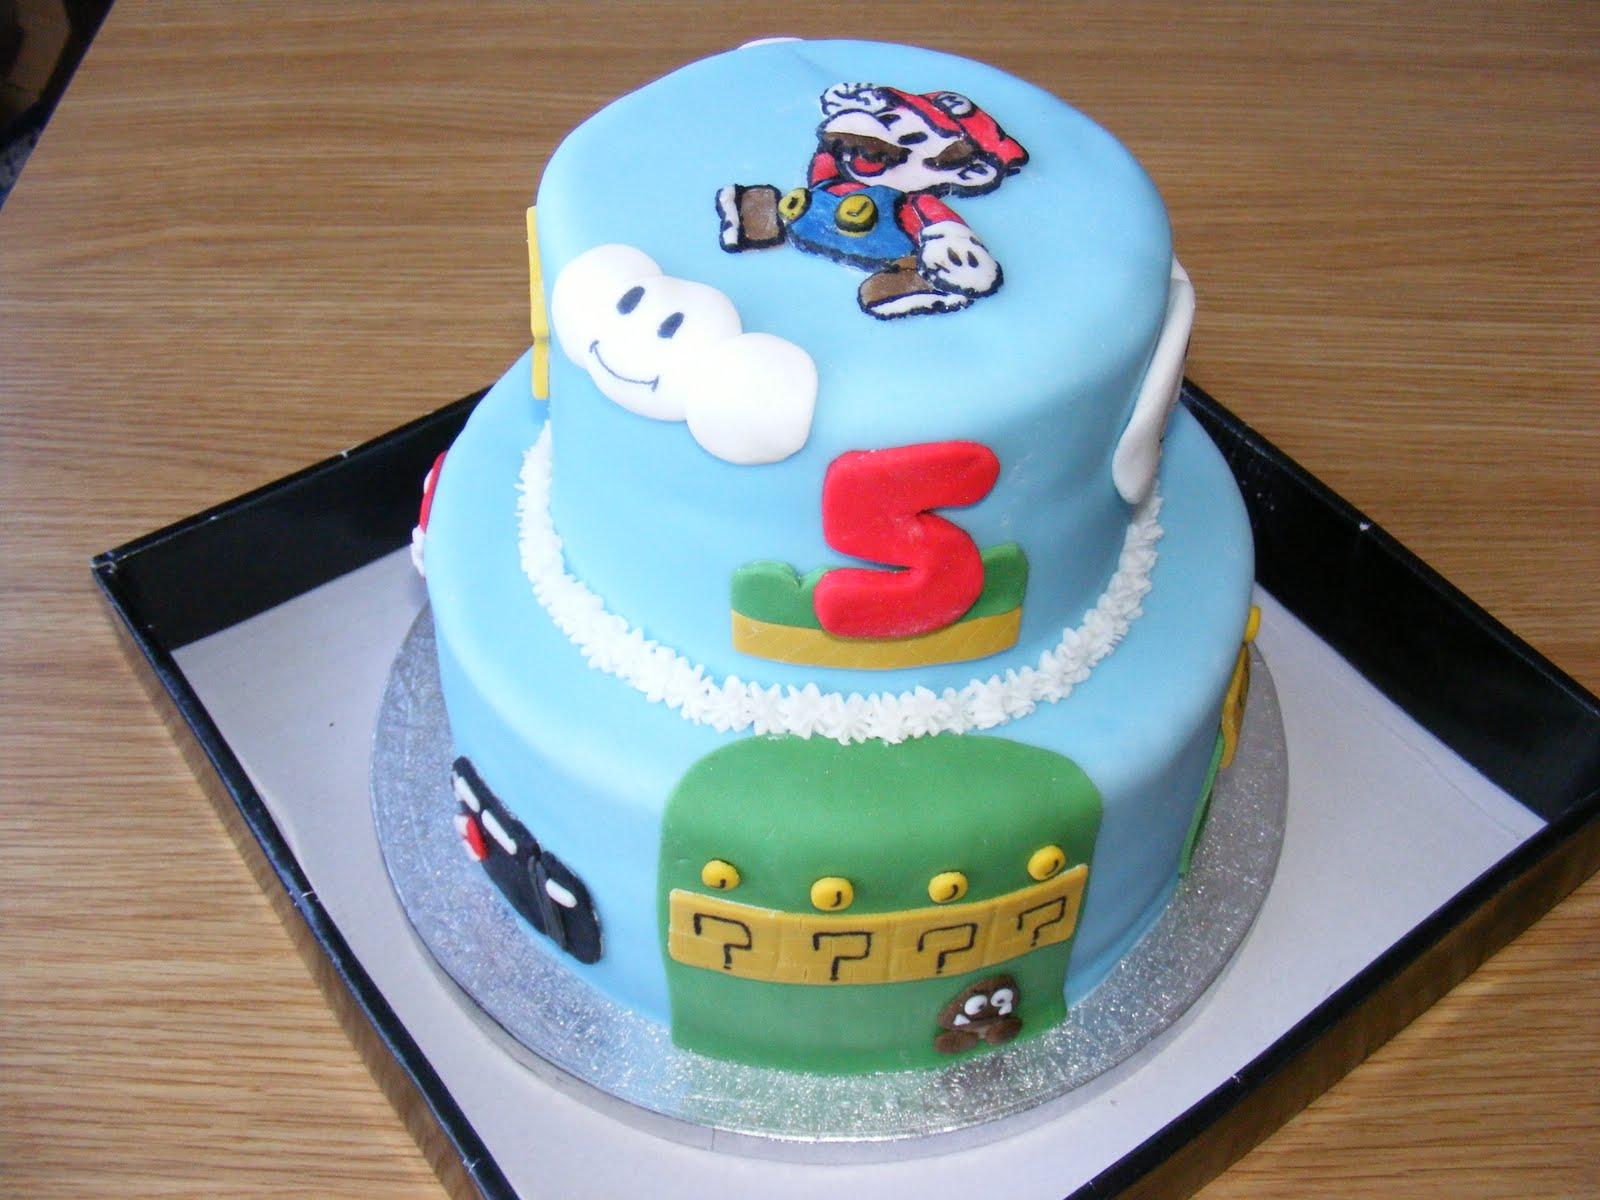 Victory Rolls Mixing Bowls Super Mario 5th Birthday Cake